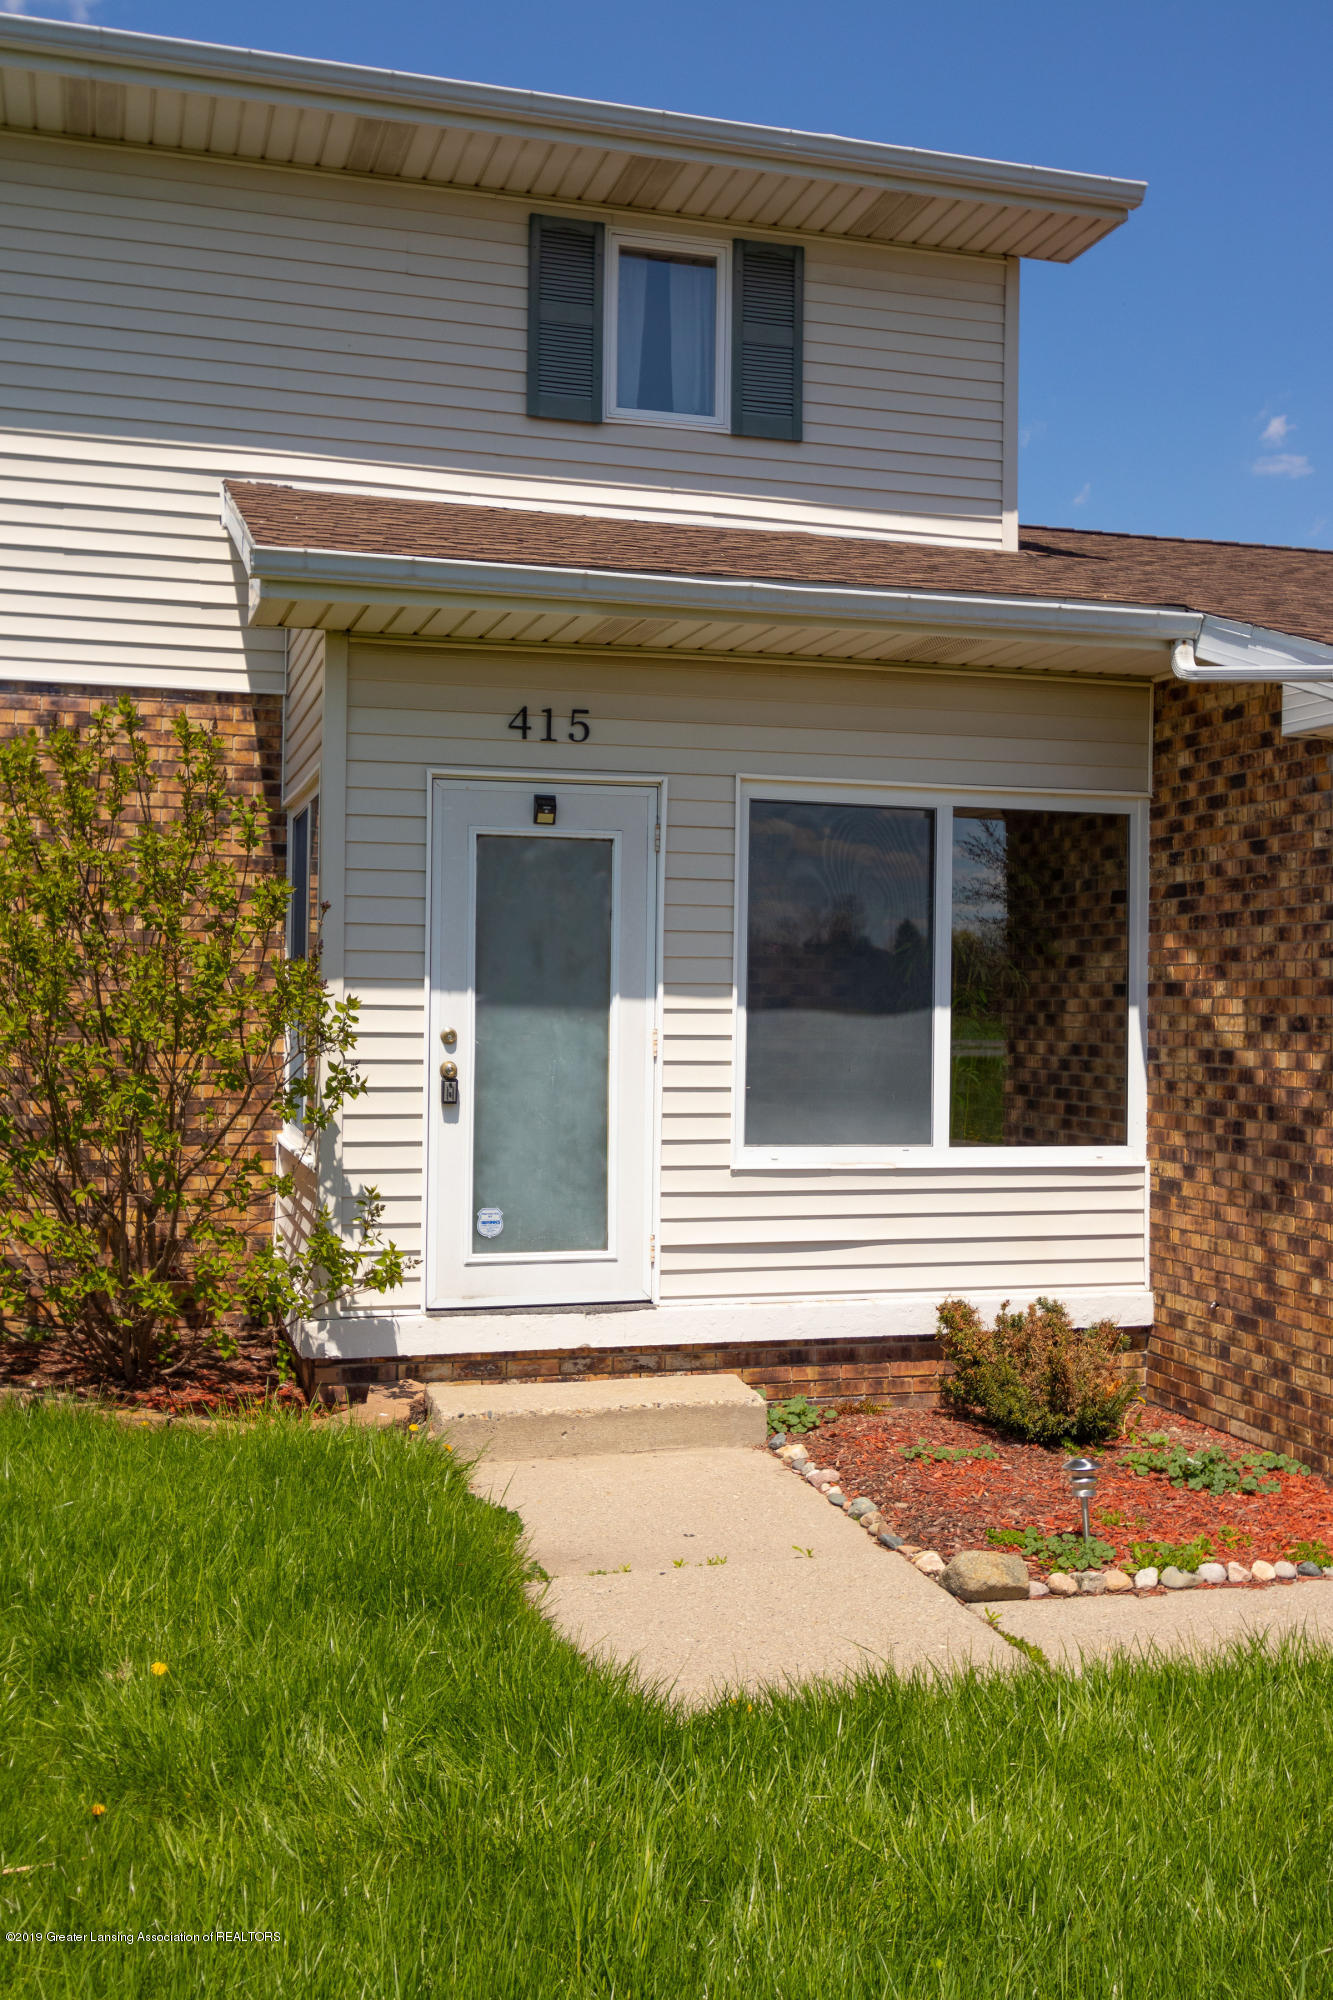 415 Holt Rd - Enclosed porch - 8